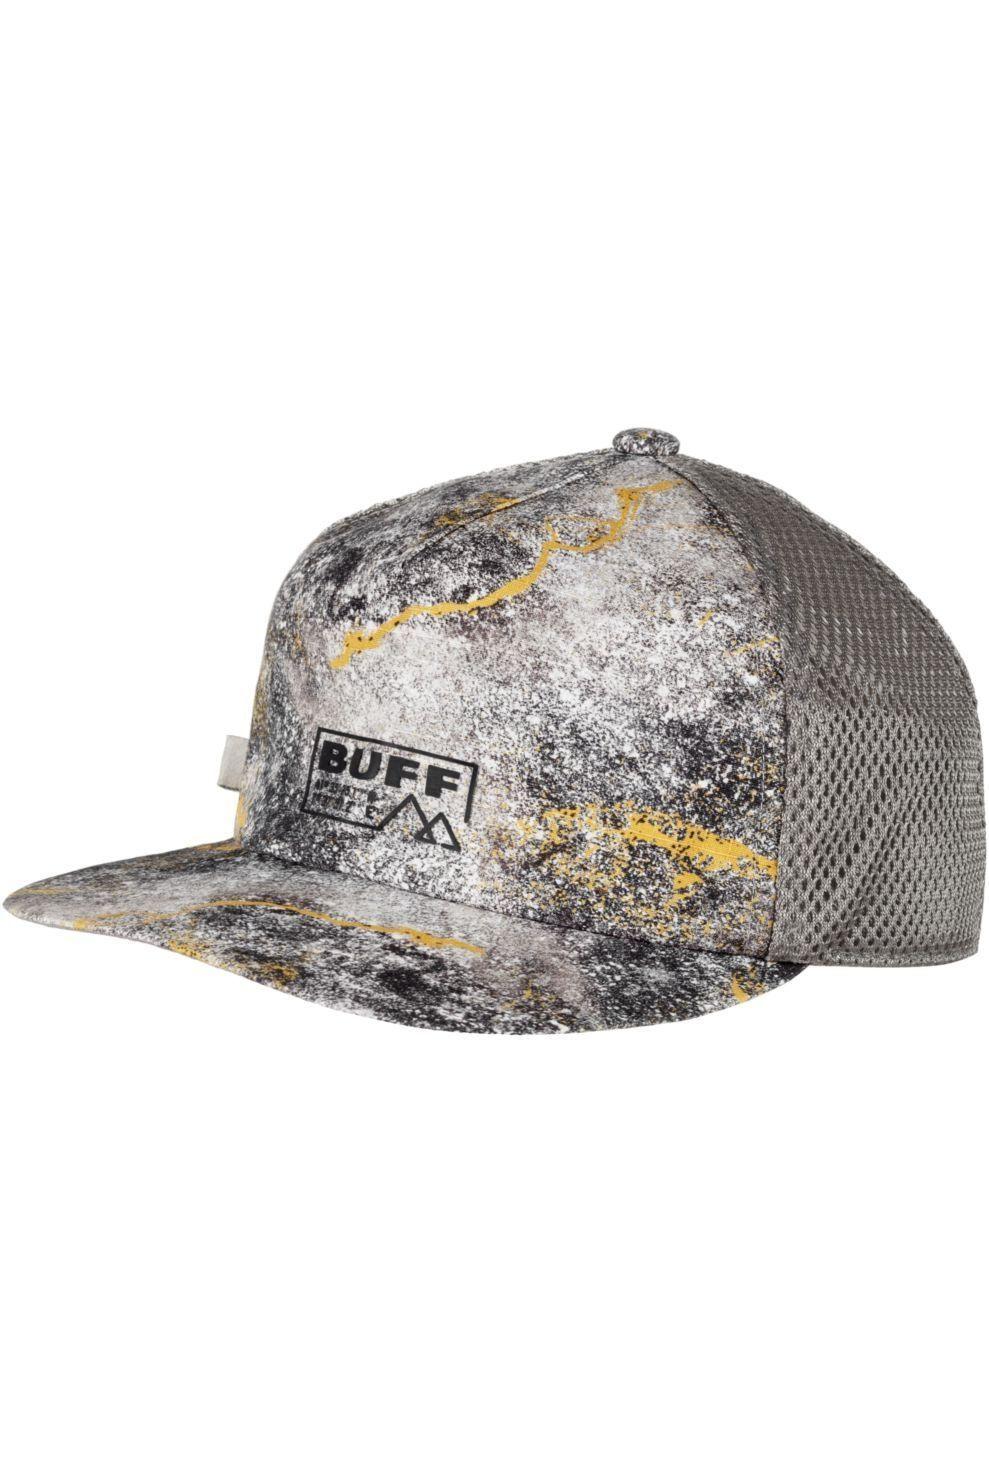 BUFF Pet Pack Trucker - Grijs/Patroon